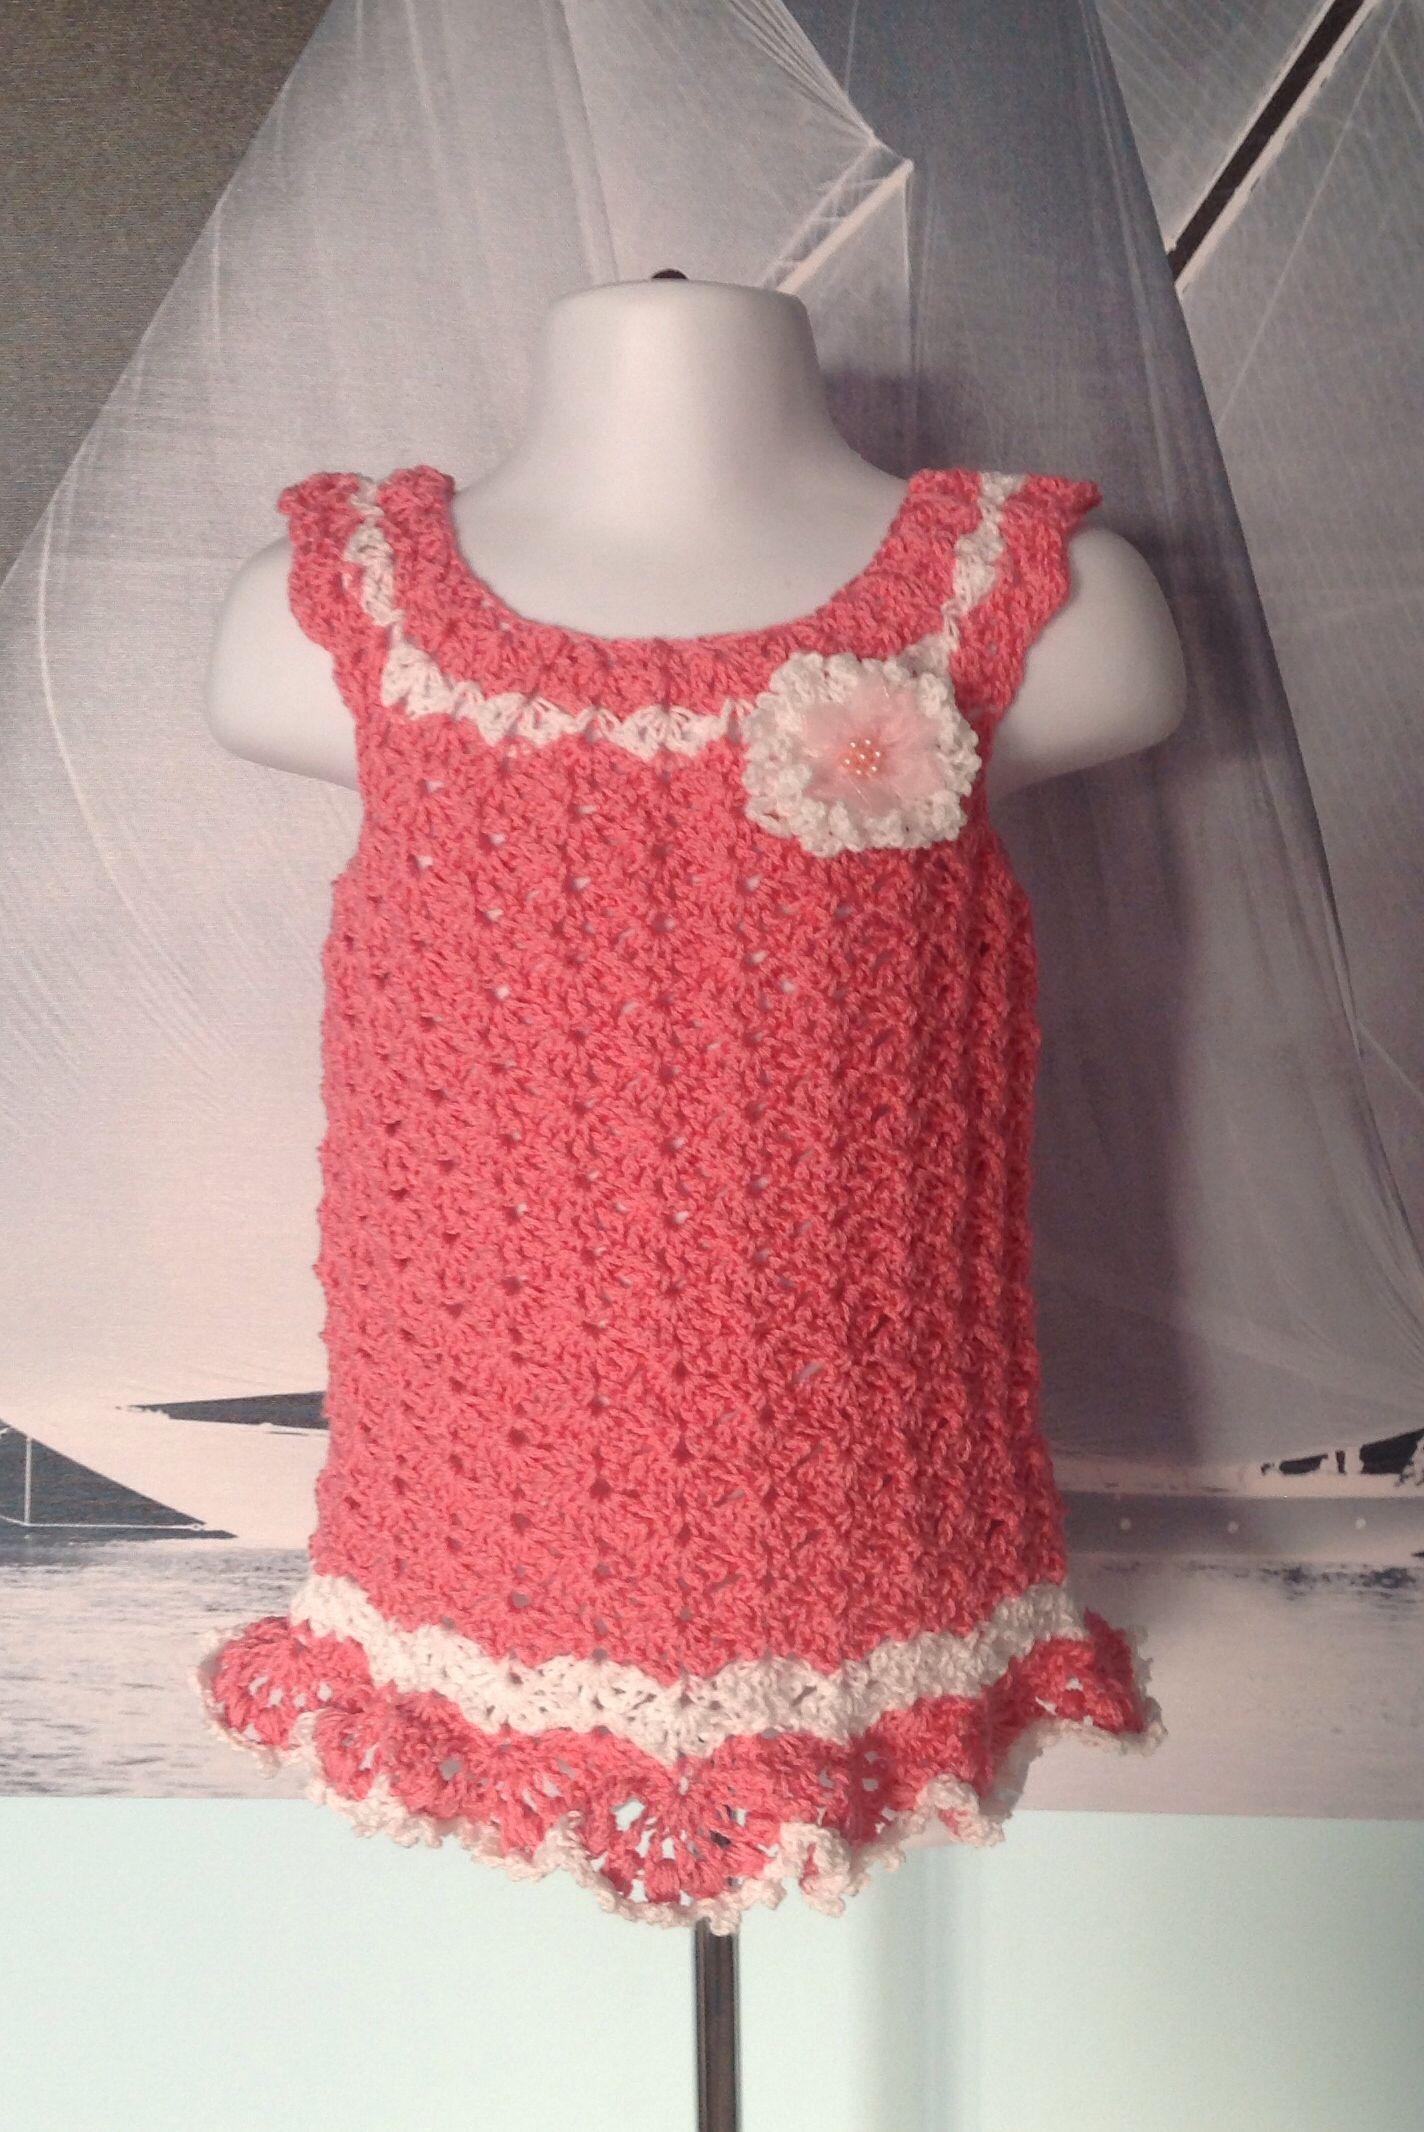 Park Art My WordPress Blog_Red Baby Dress 6 9 Months